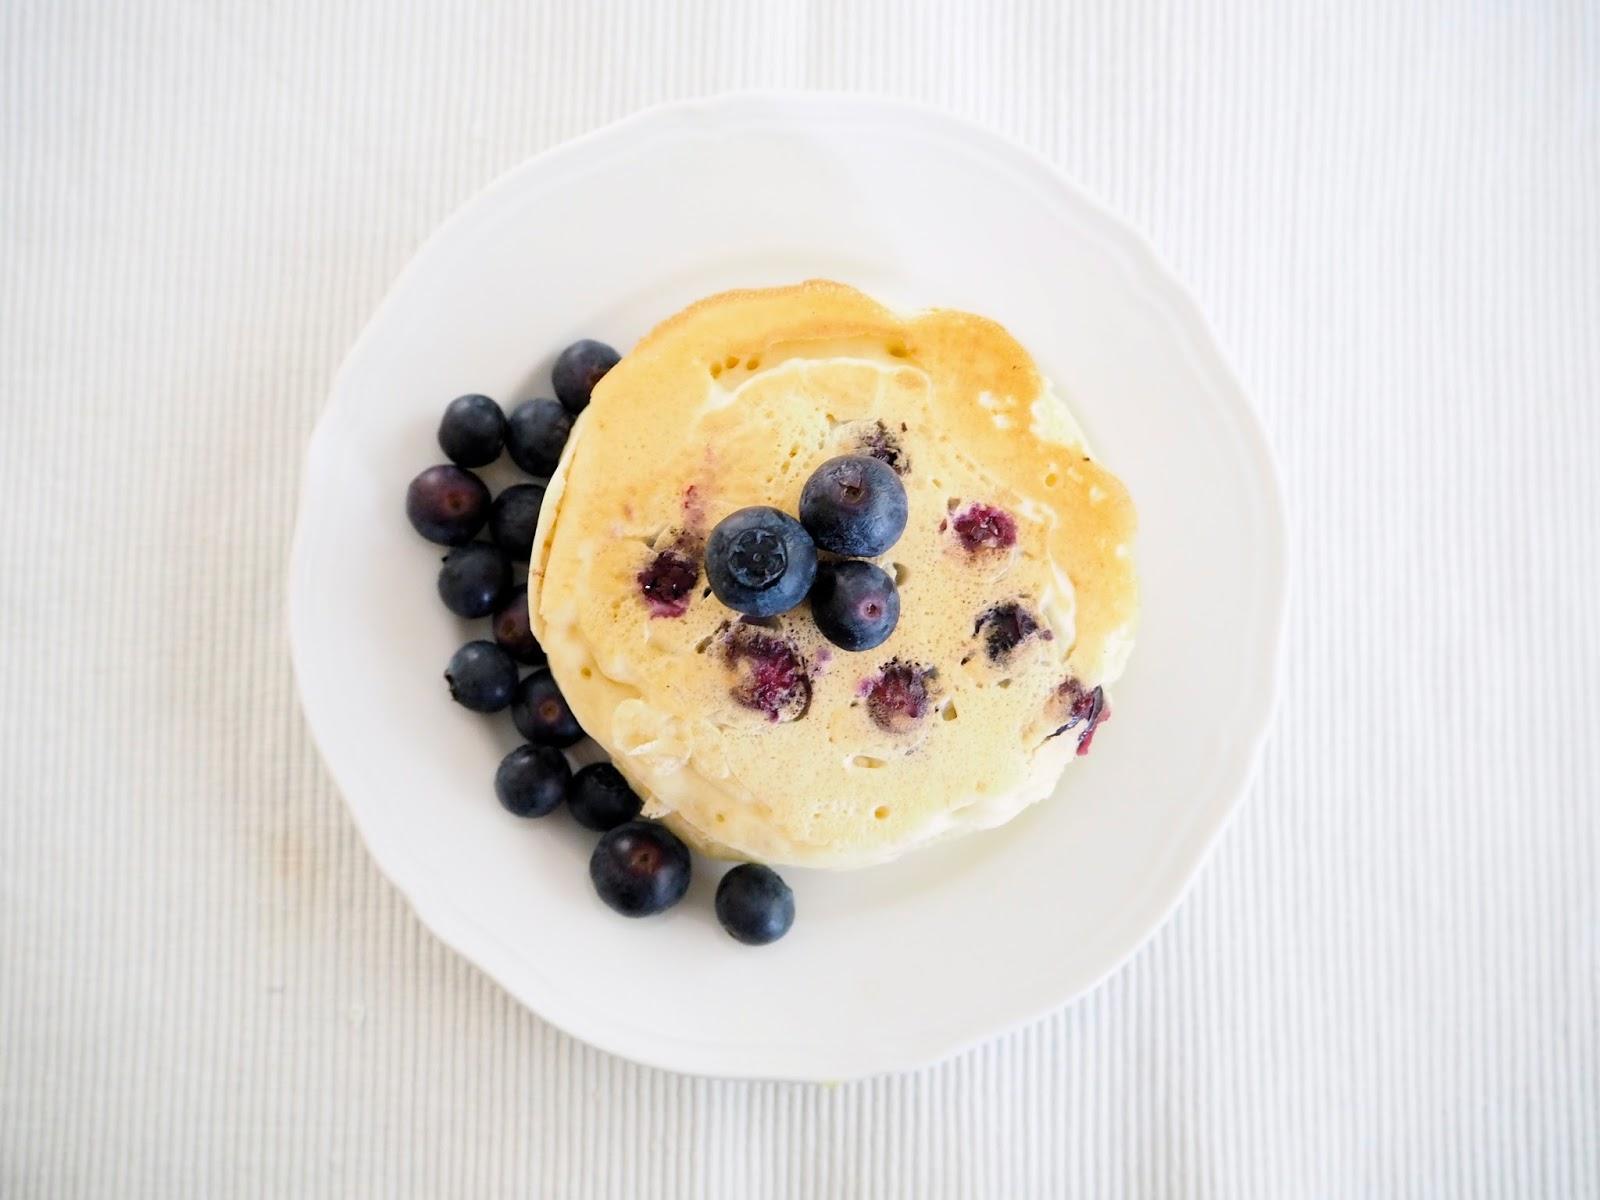 Vegan Blueberry Pancakes, recipe, vegan food, healthy, quick, easy recipe